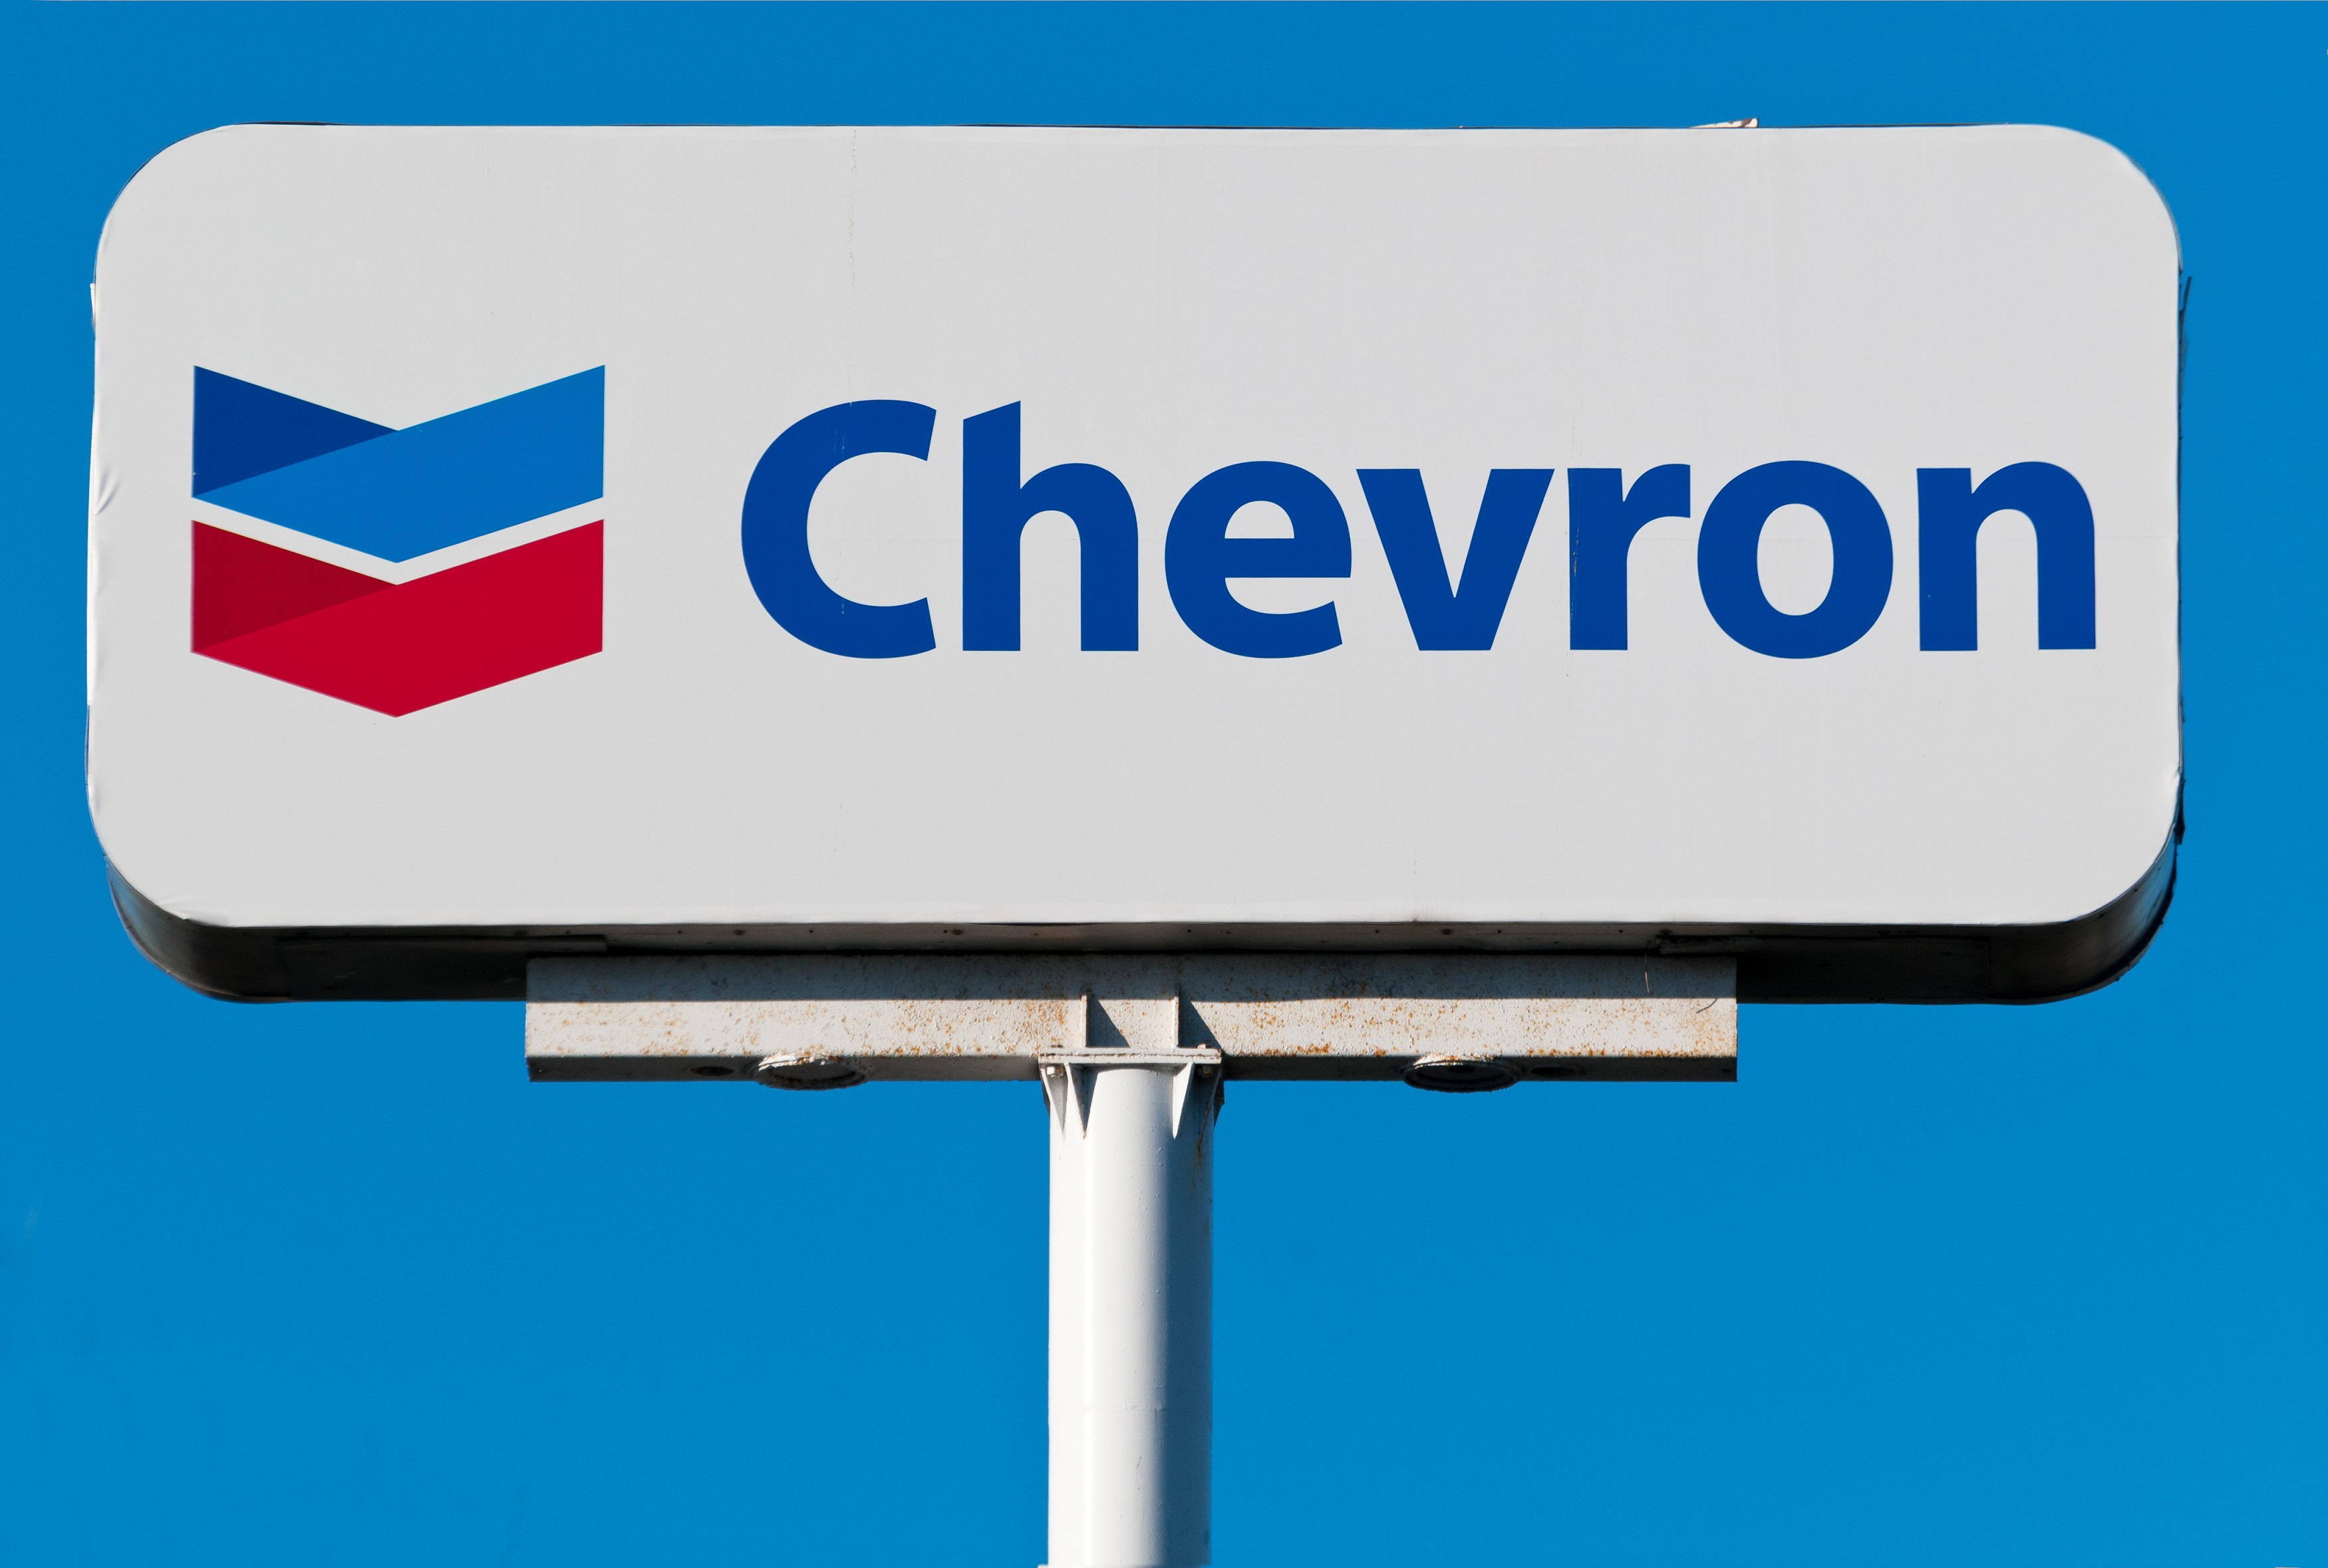 Top 10 Oil & Gas Companies: Chevron Corporation | Oil & Gas IQ